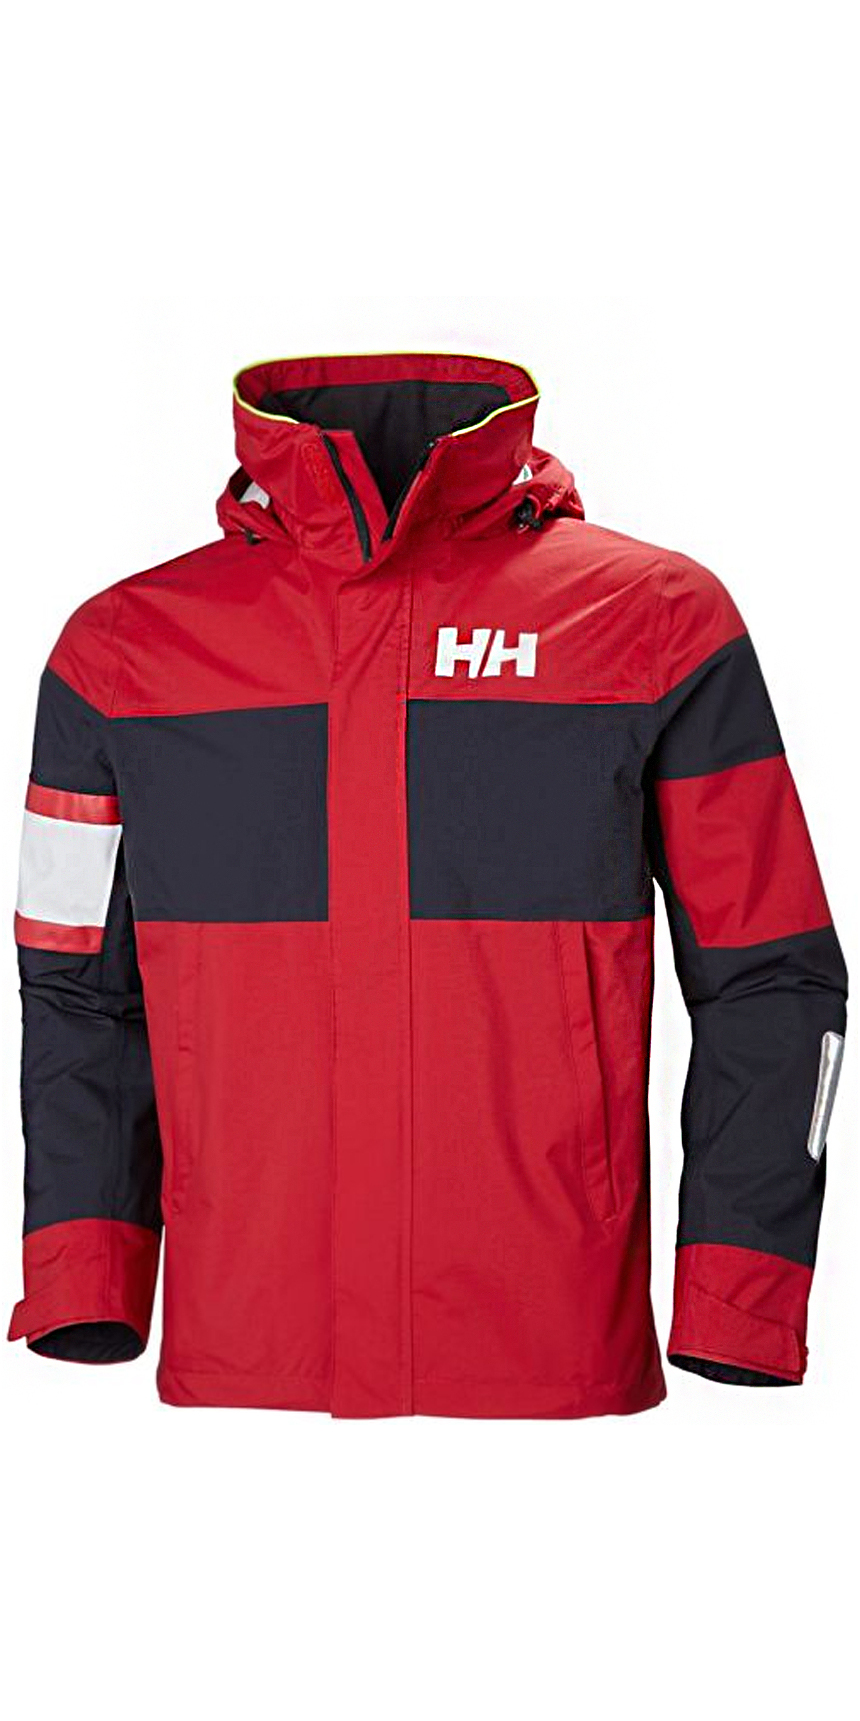 50bd5b6f 2019 Helly Hansen Salt Light Jacket Alert Red 33911 - Helly Hansen Sailing  Jackets - Jackets   Wetsuit Outlet